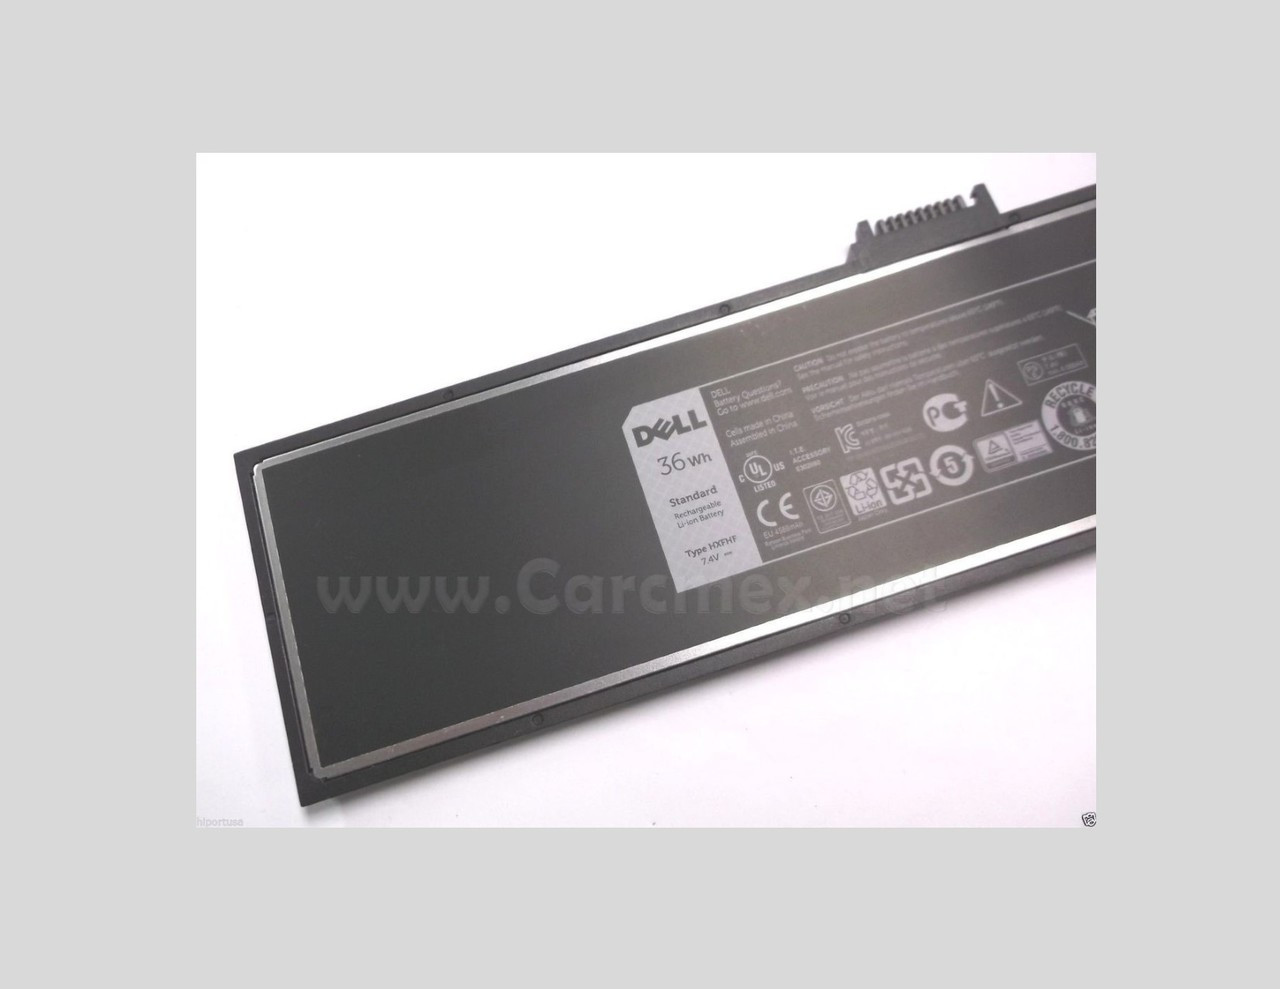 DELL Tablet Venue 11 PRO (7130 / 7139) Original Battery 2